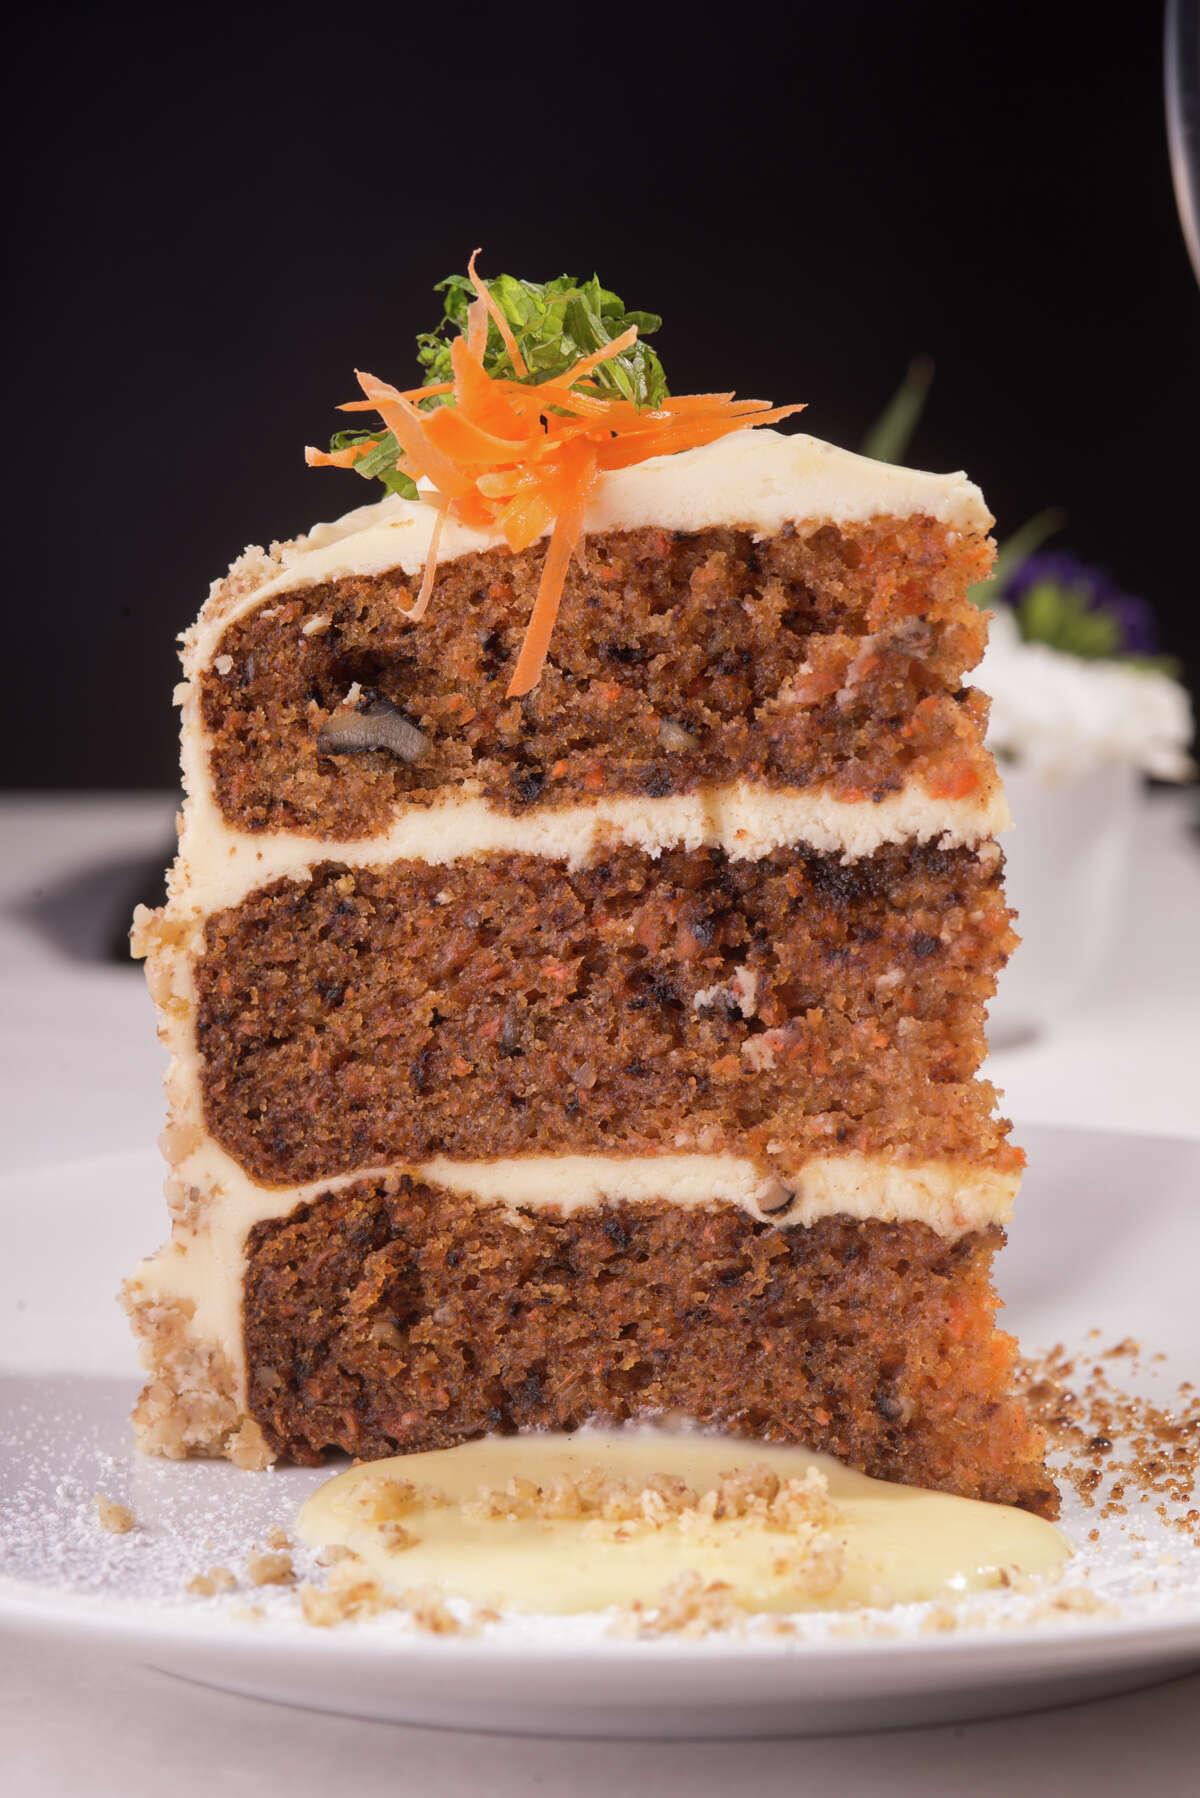 Carrot cake from Valeria Farm to Table Restaurant in Boerne.